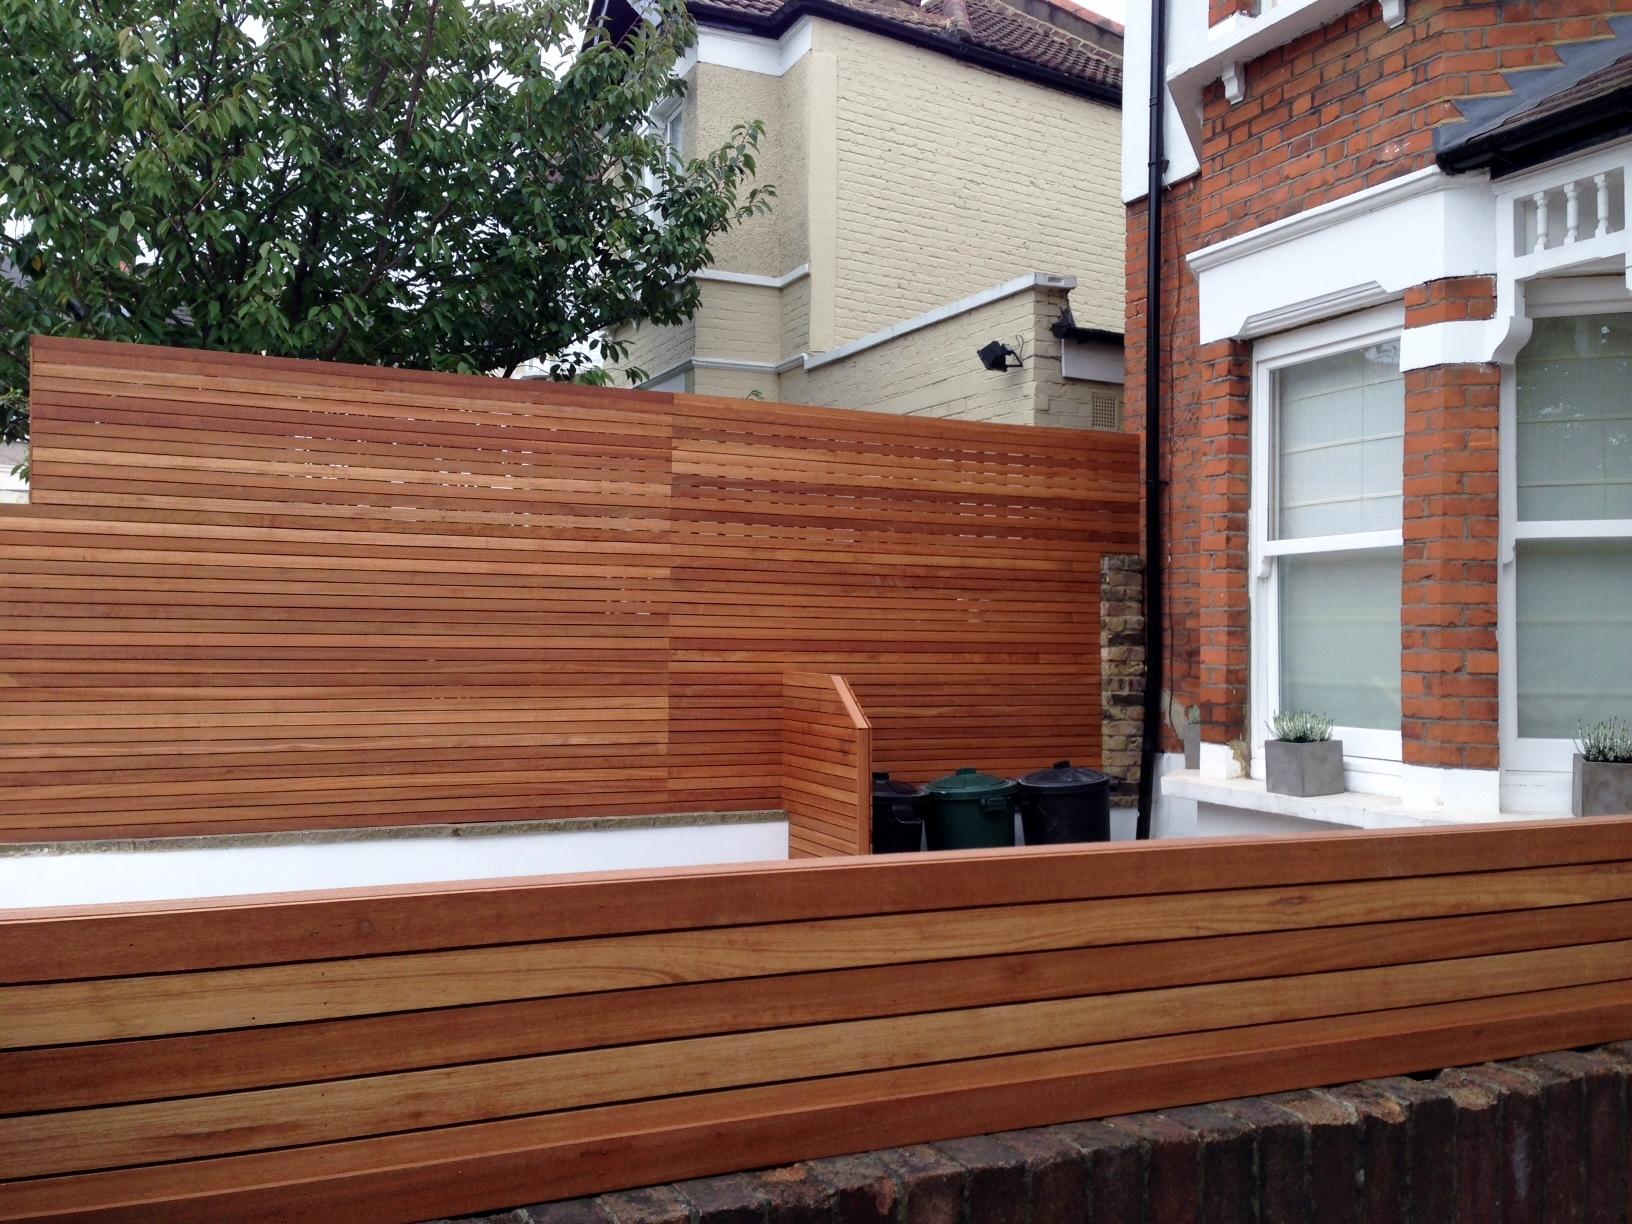 front garden drivewat gravel travertine paving path hardwood privacy screen trellis tooting london (23)